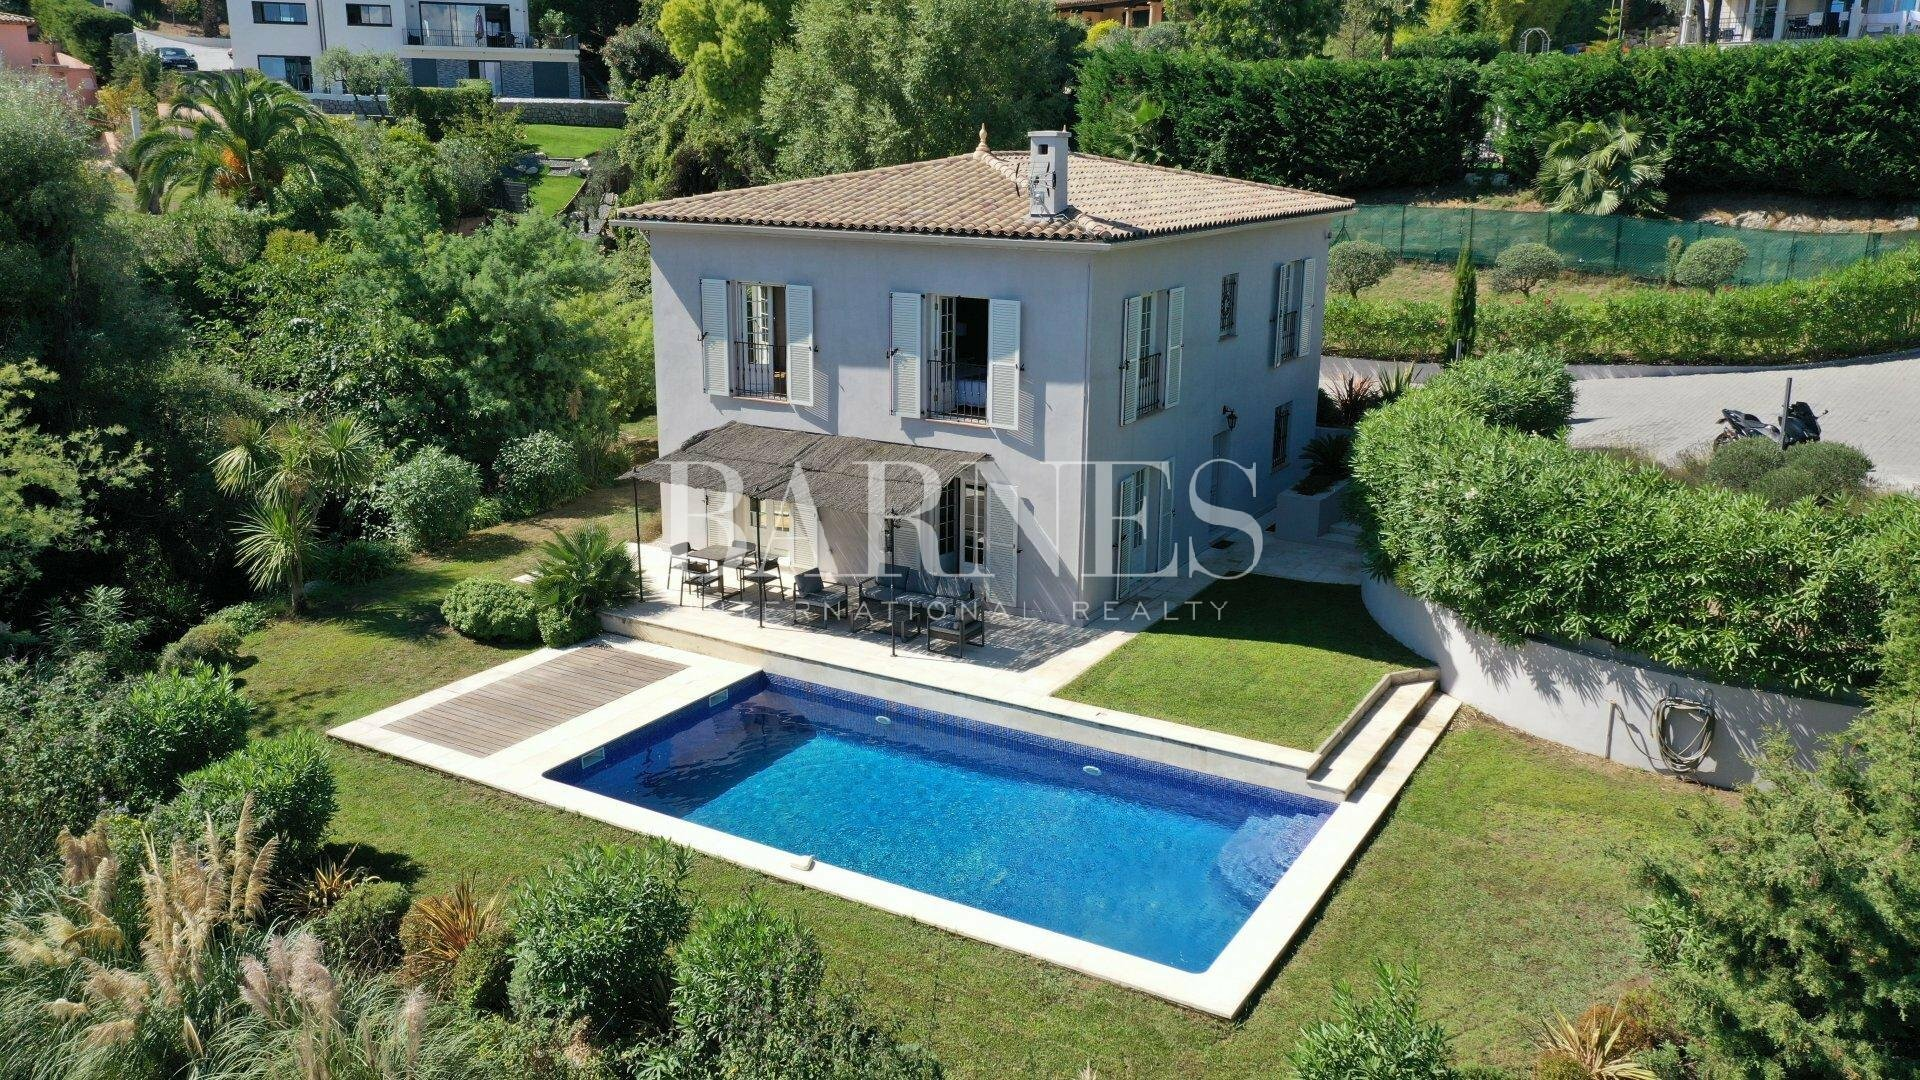 Villa in Vallauris, Provence-Alpes-Côte d'Azur, France 1 - 11586305